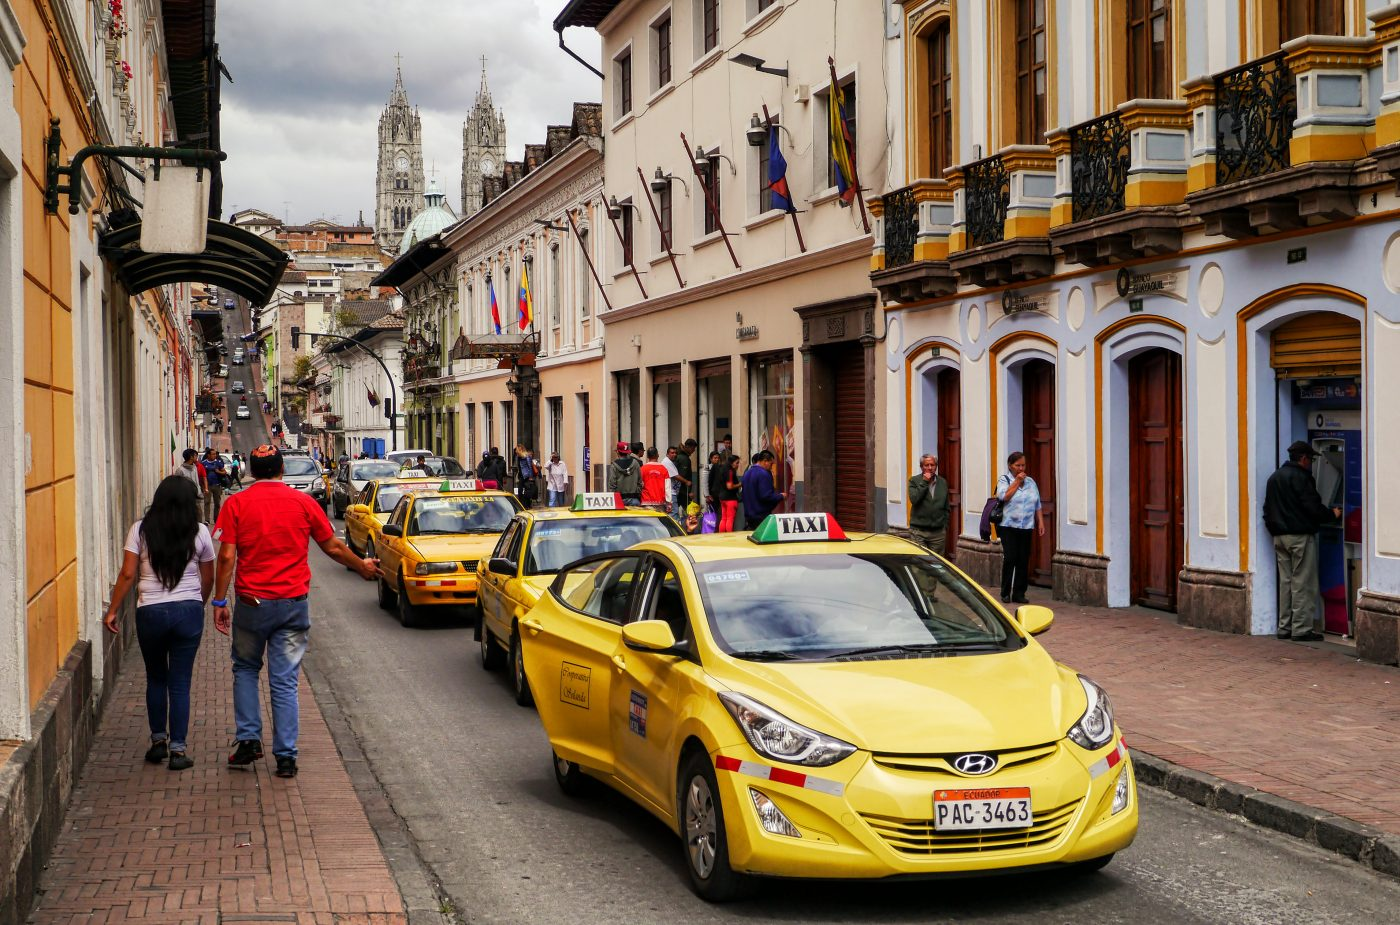 Quito relacja z Ekwadoru. Centro Histórico